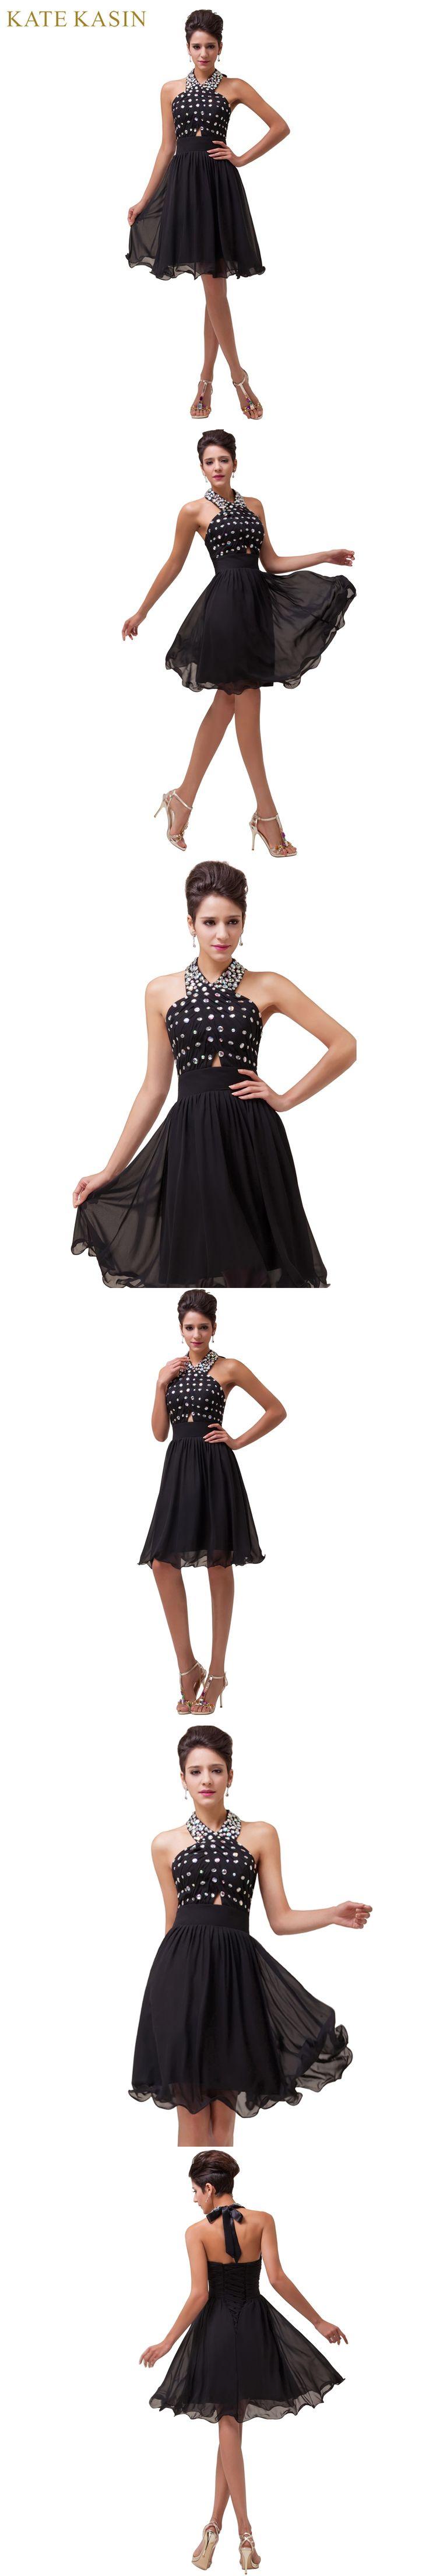 120 best Cocktail Dresses images on Pinterest